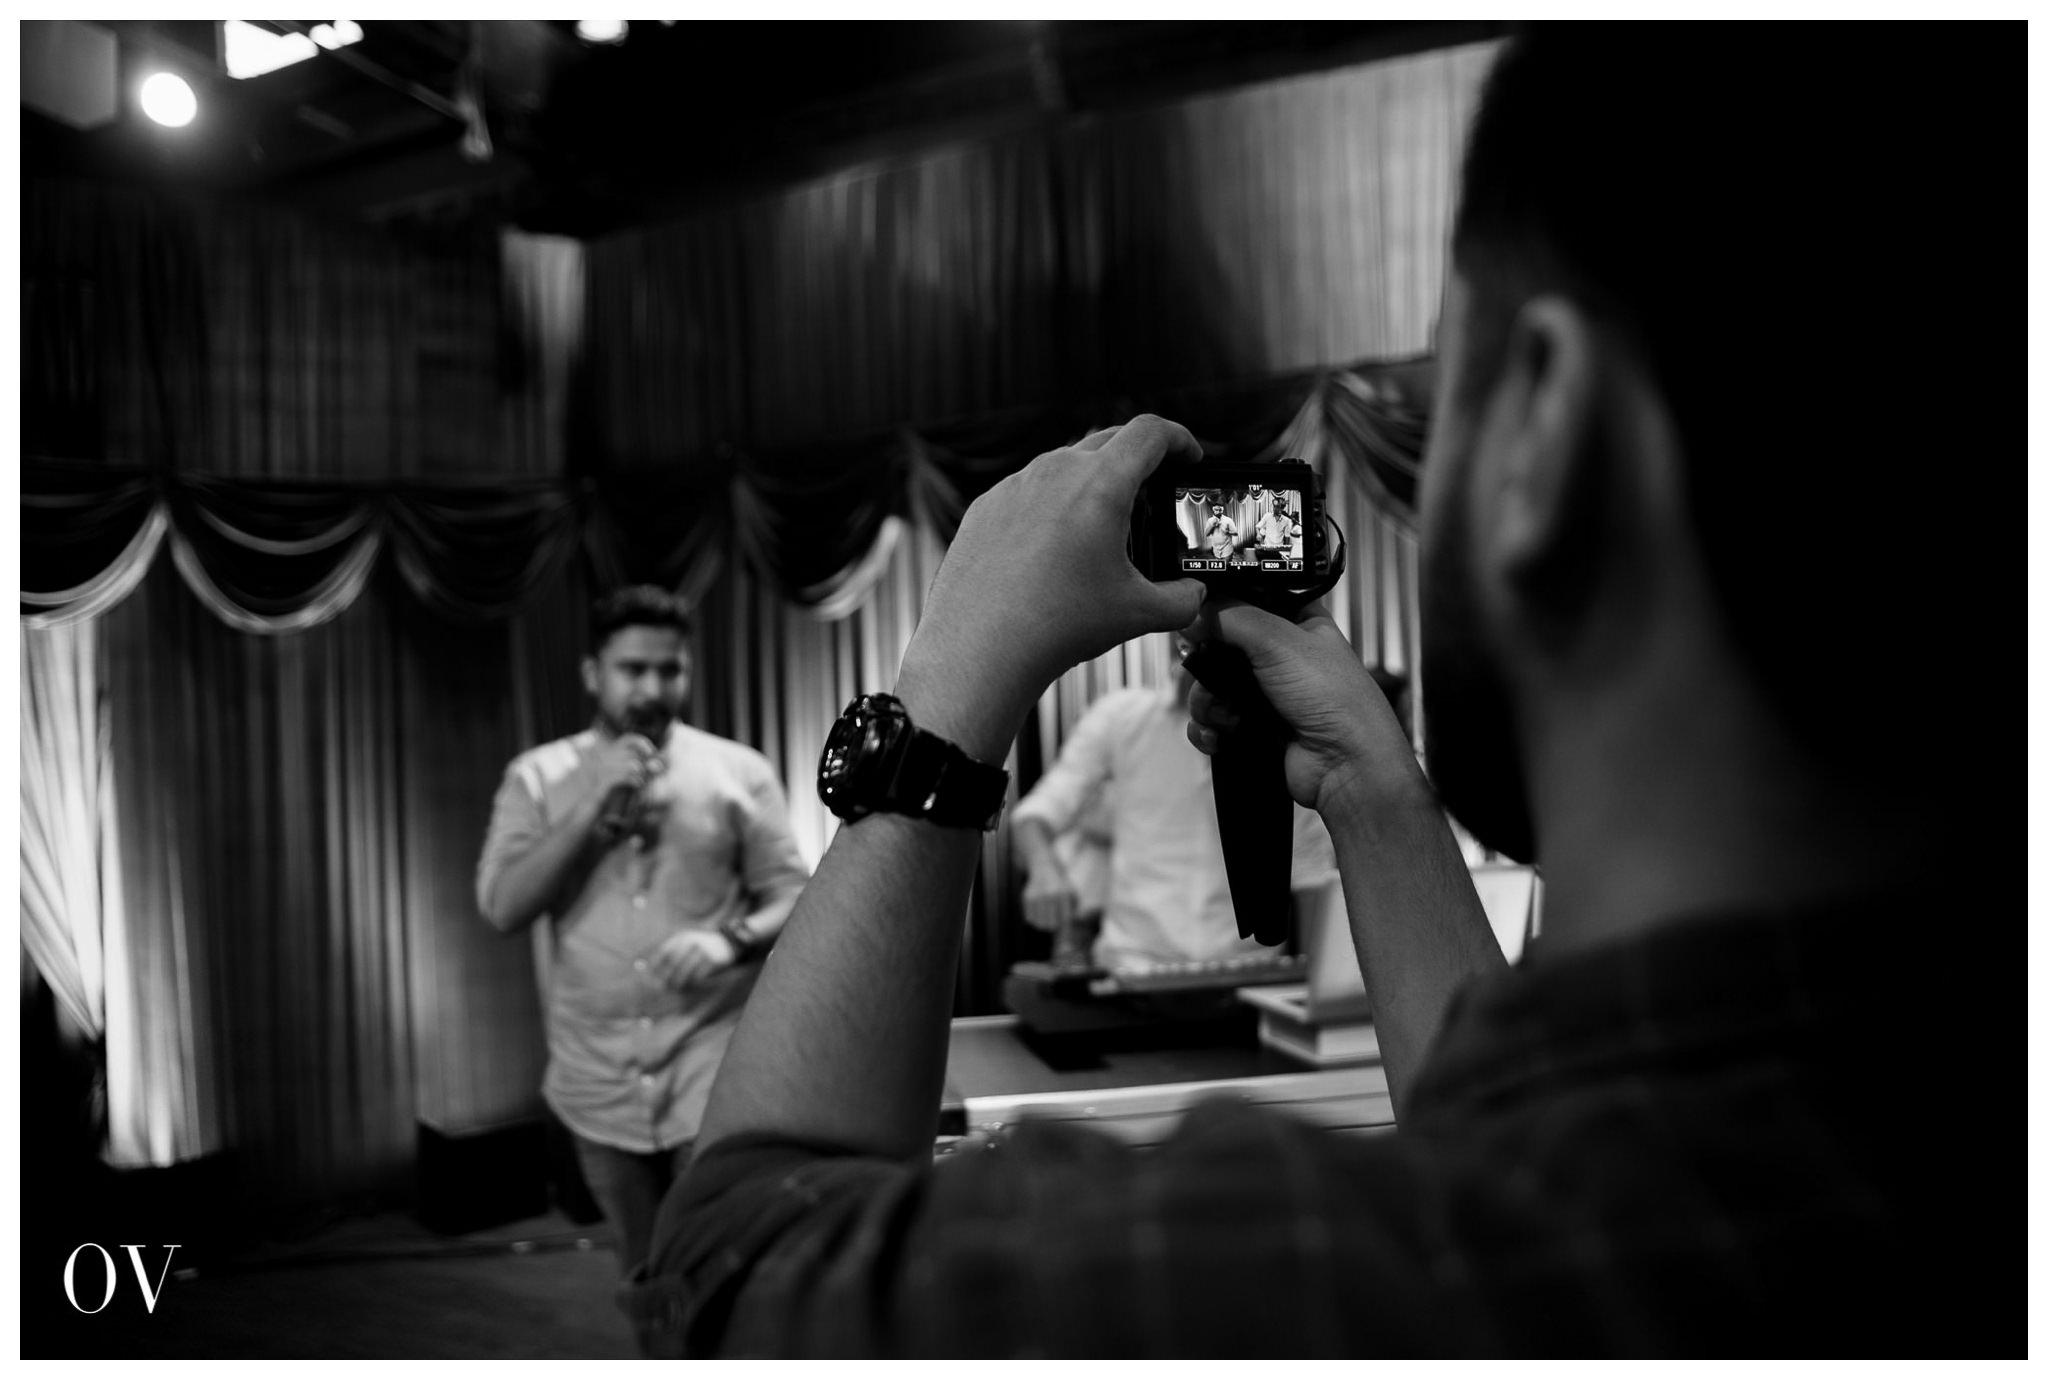 Abish Mathew-Son of Abish-Behind the scenes-35.JPG